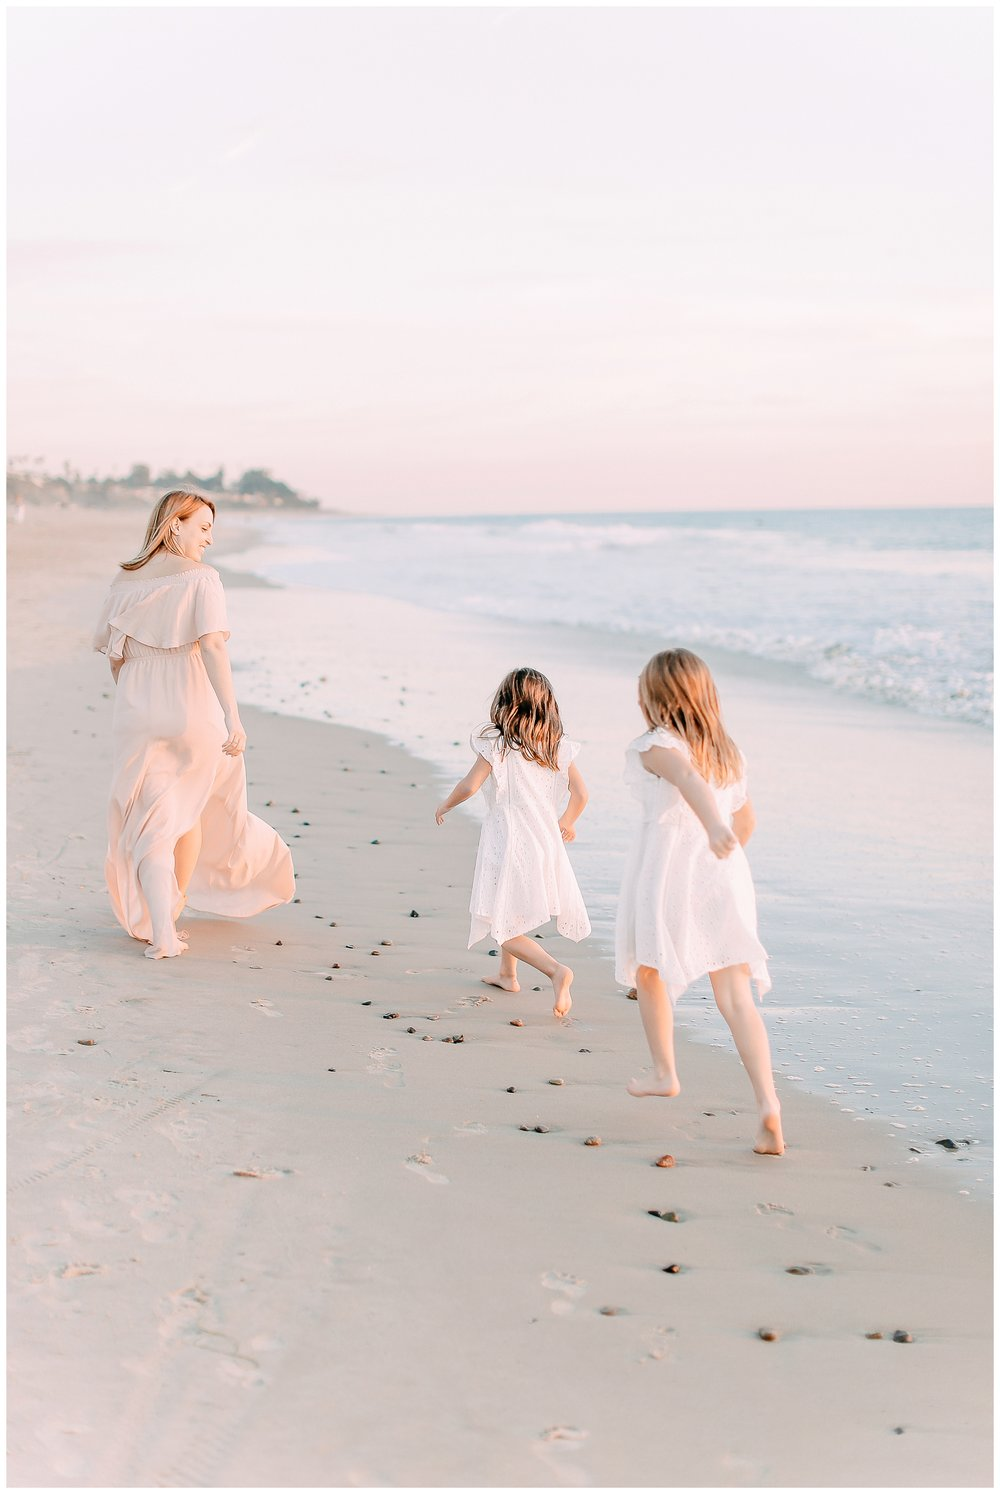 San_clemente_family_session_Orange_county_family_photographer_cori_kleckner_photography_laguna_beach_family_session_0697.jpg